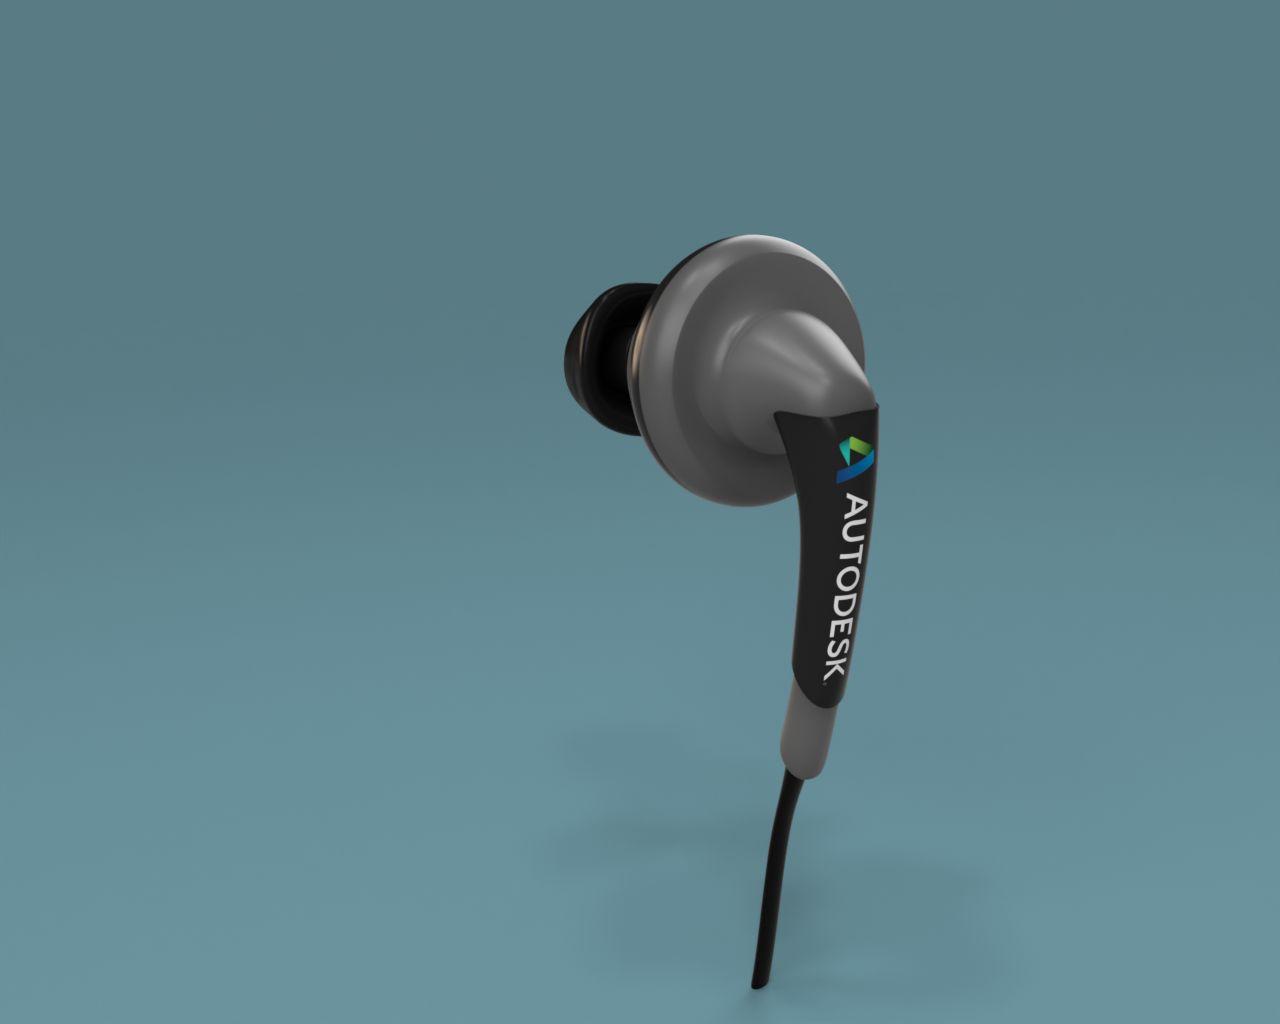 Earphone-in-progress-2017-mar-09-04-56-45pm-000-customizedview13655748668-3500-3500